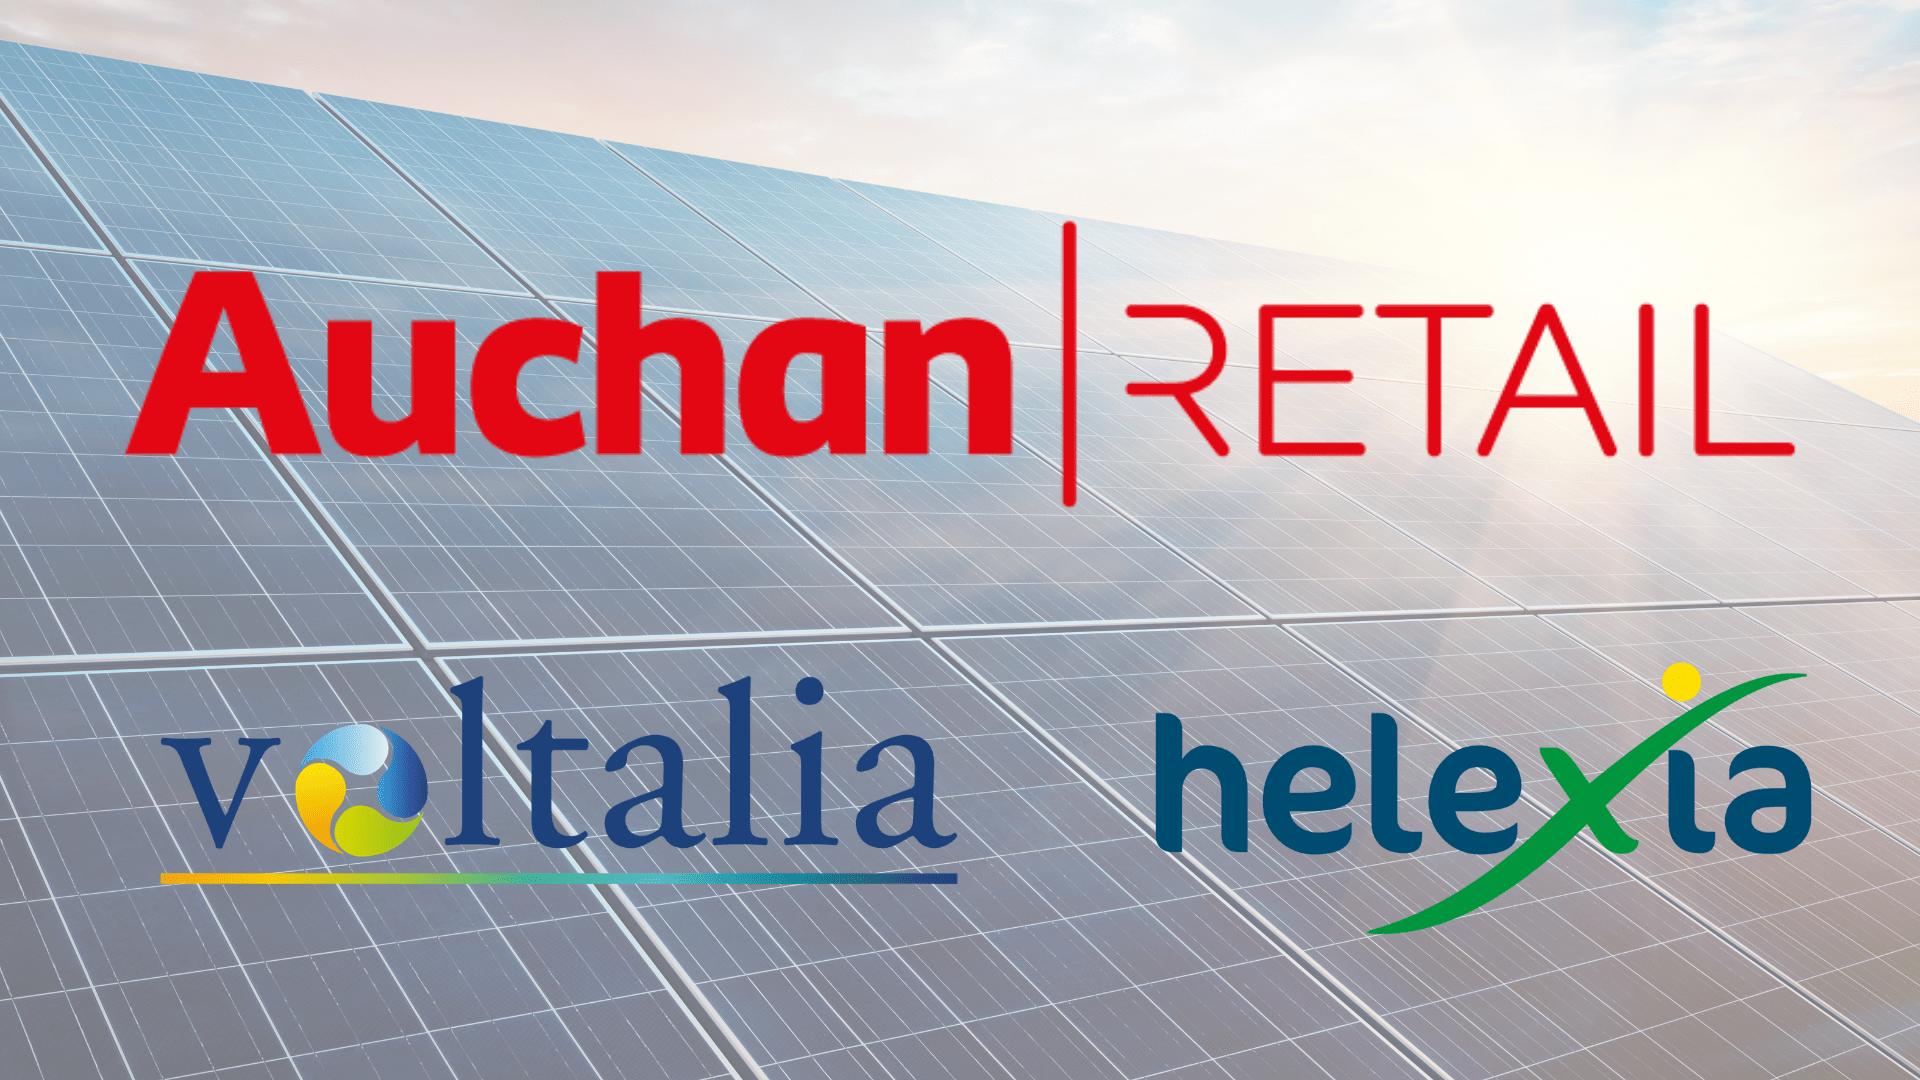 Partenariat Mondial Auchan Voltalia Helexia